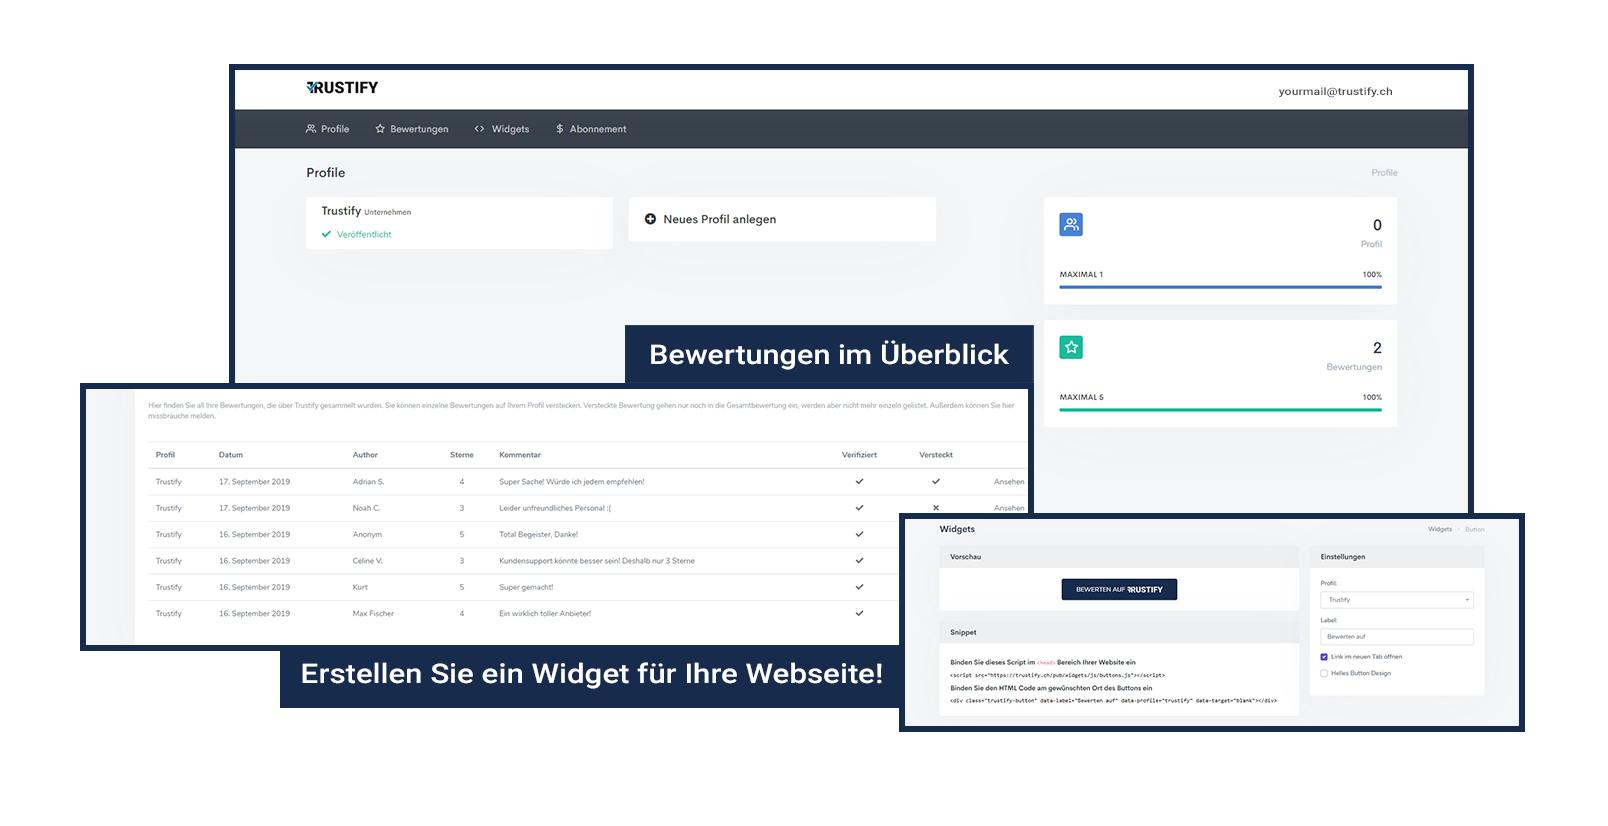 Desktop Preview of Trustify Dashboard